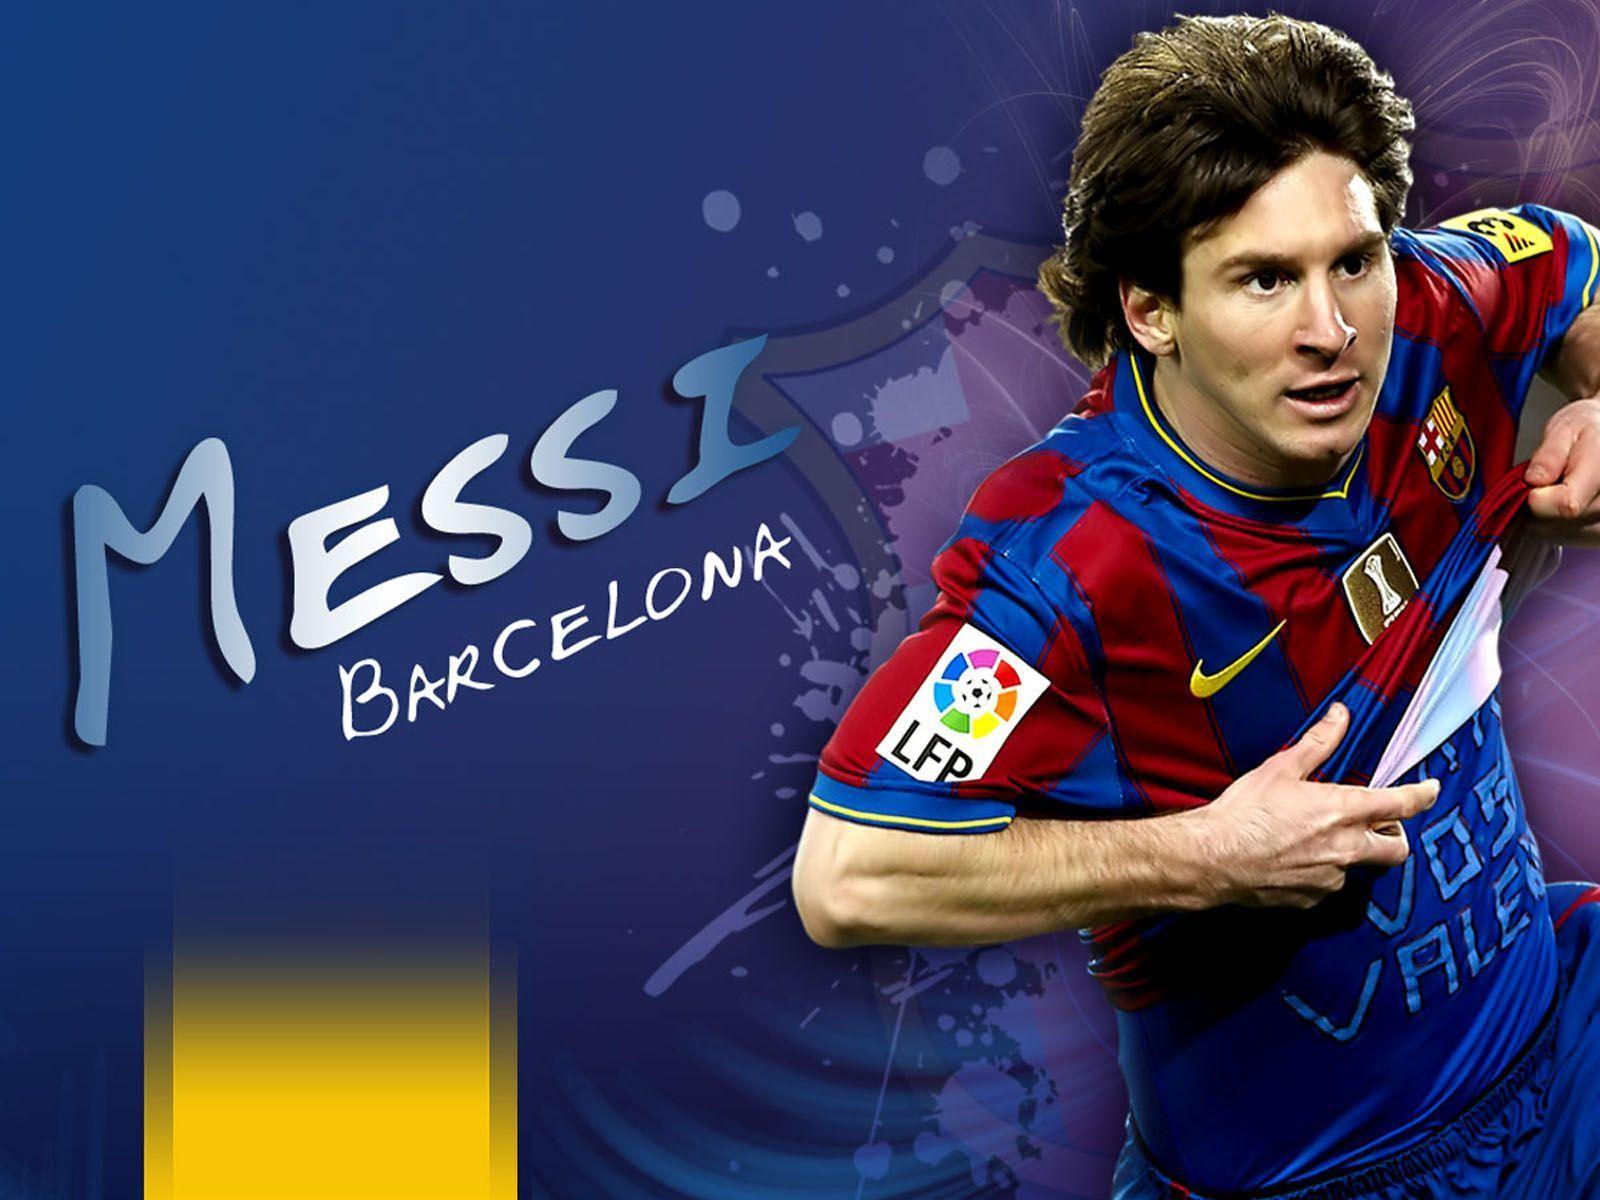 Lionel Messi 1080p Hd Wallpaper Widescreen Hd Wallpapers Source Lionel Messi Messi Lionel Messi Barcelona